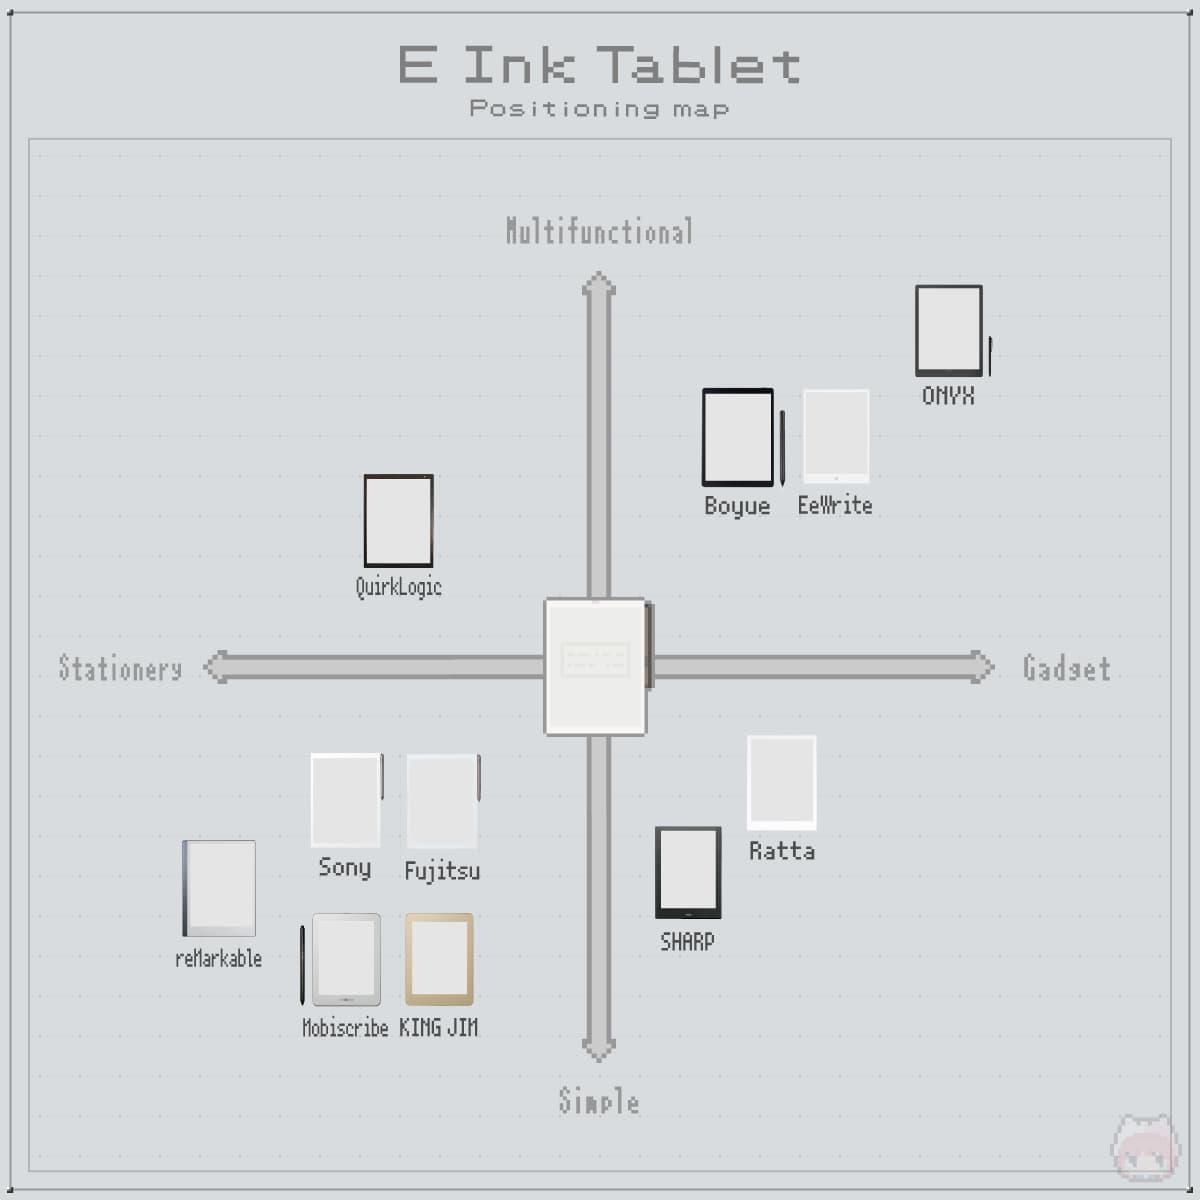 E Ink(電子ペーパー)タブレット|ポジショニングマップ